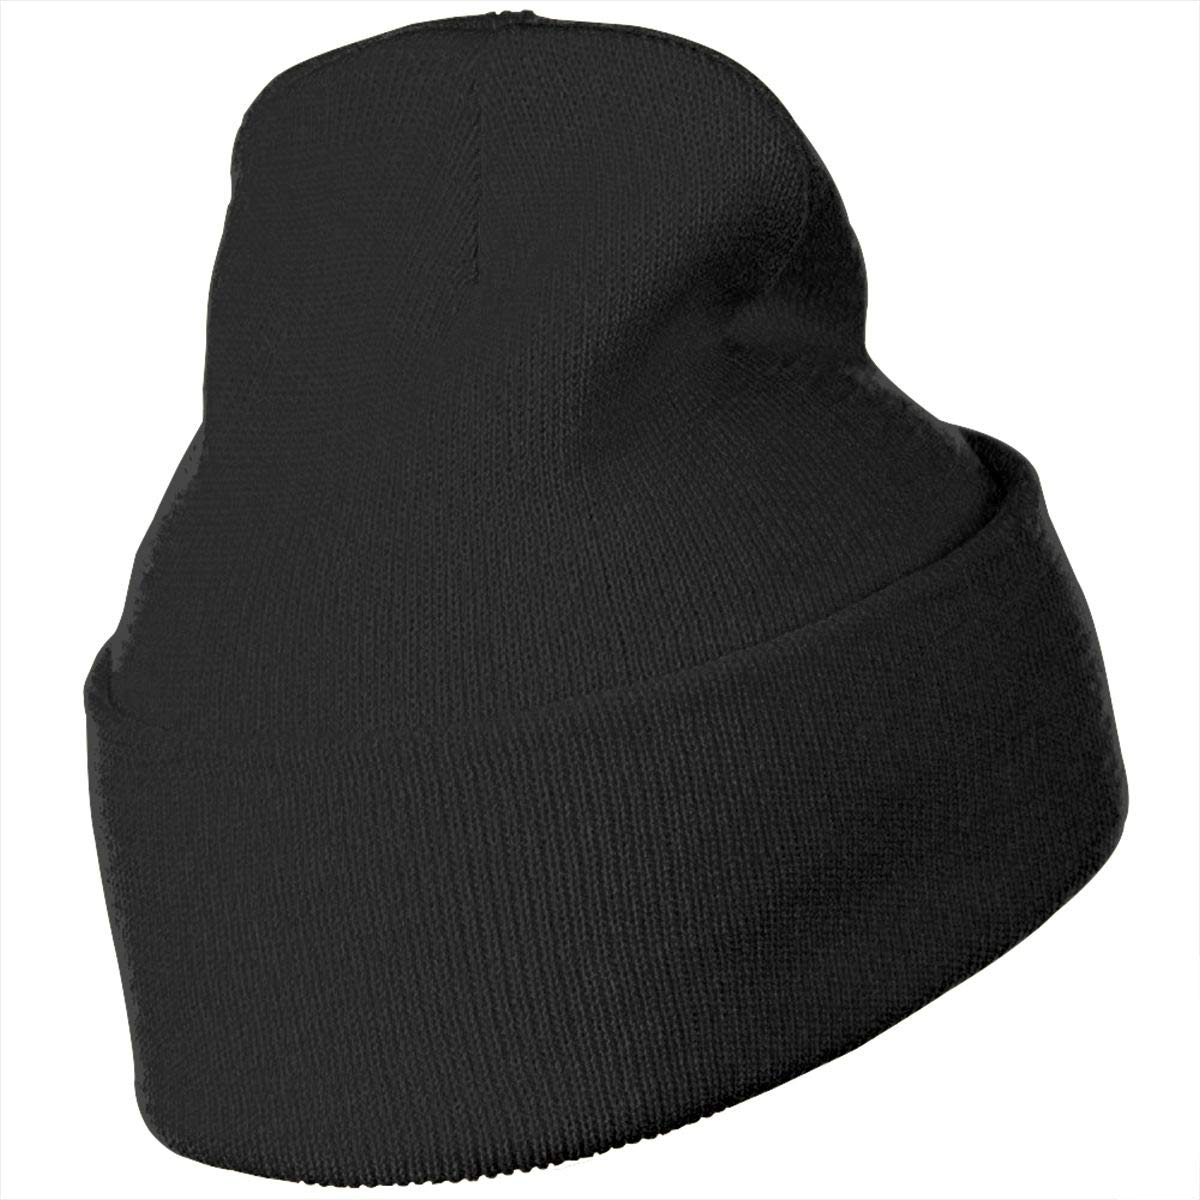 Yubb7E Elephant Warm Knit Winter Solid Beanie Hat Unisex Skull Cap